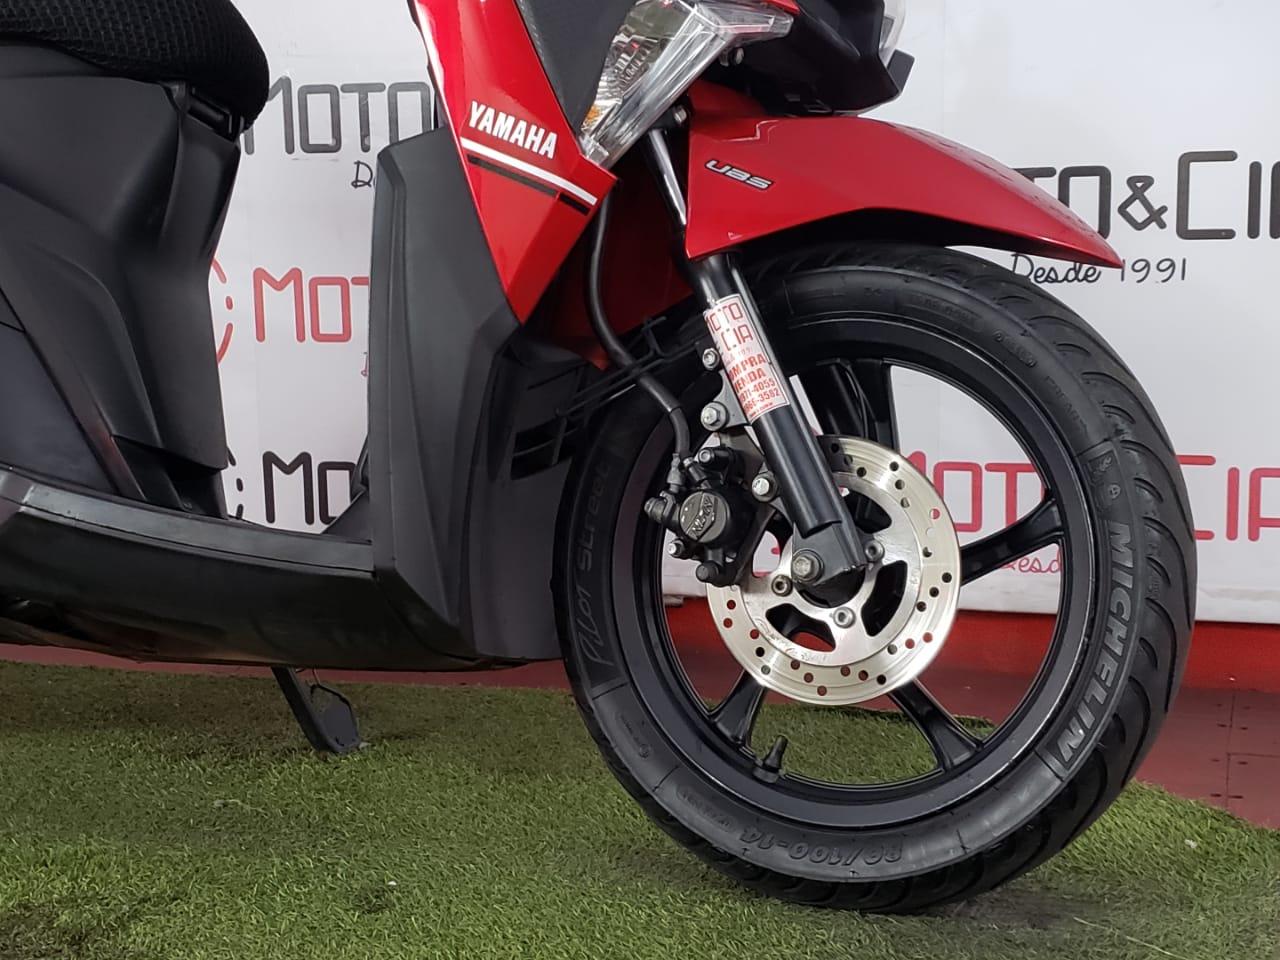 Yamaha - Neo 125